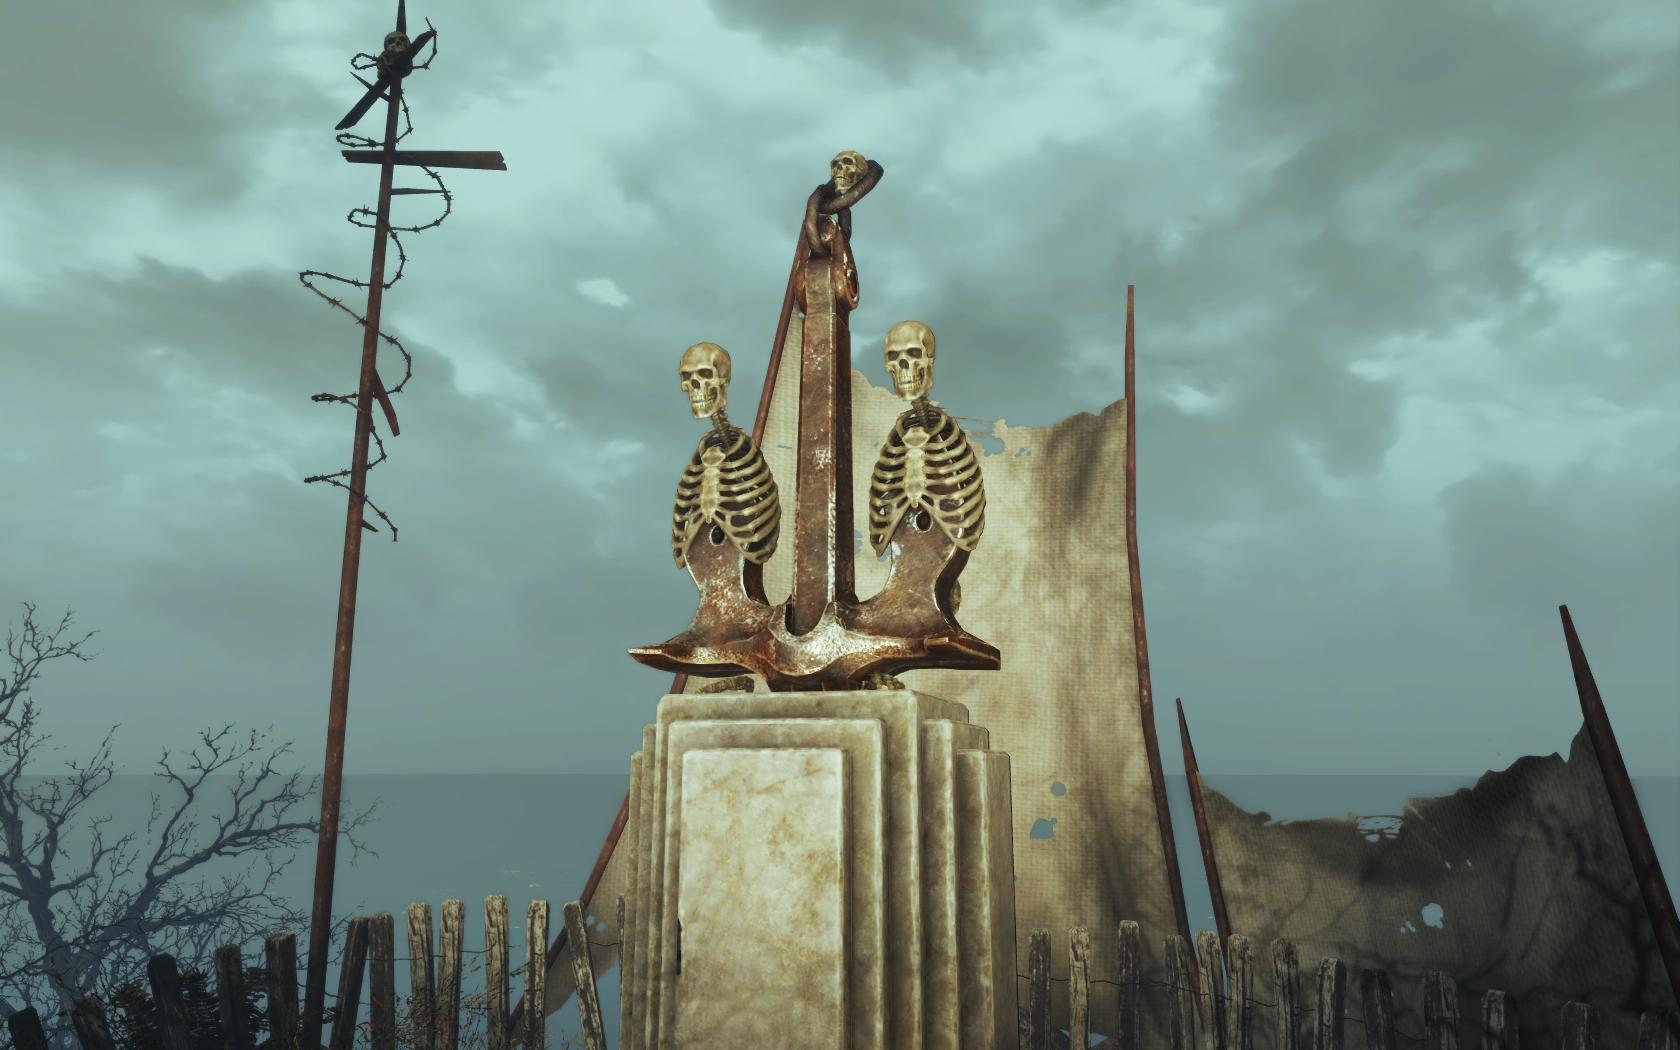 Якорь (Фар-Харбор, окрестности Азалии) v2 - Fallout 4 Азалия, скелет